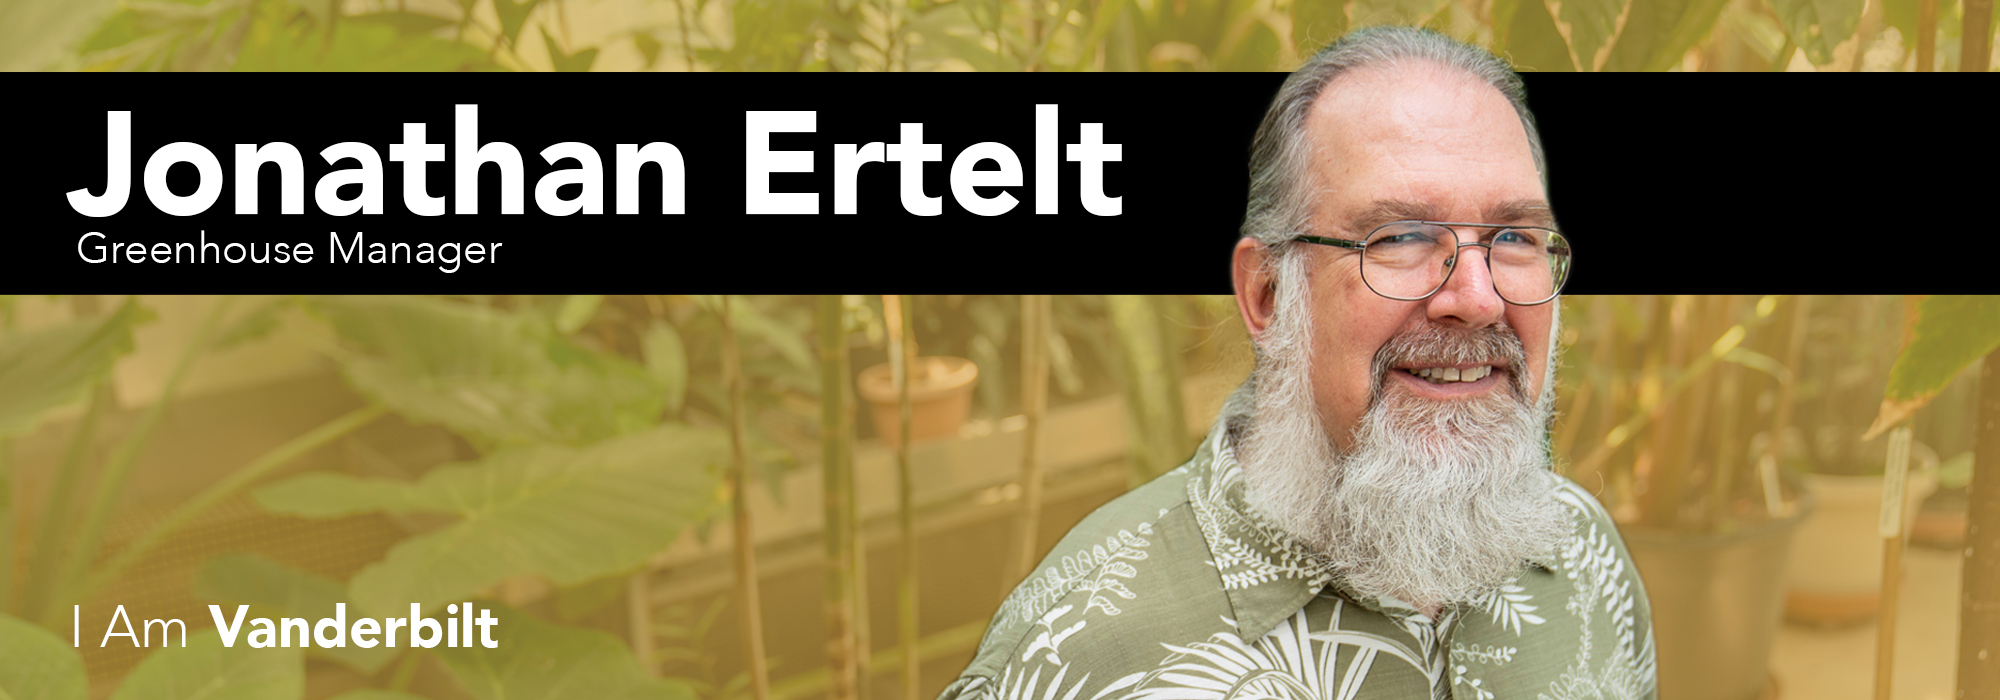 I Am Vanderbilt: Jonathan Ertelt